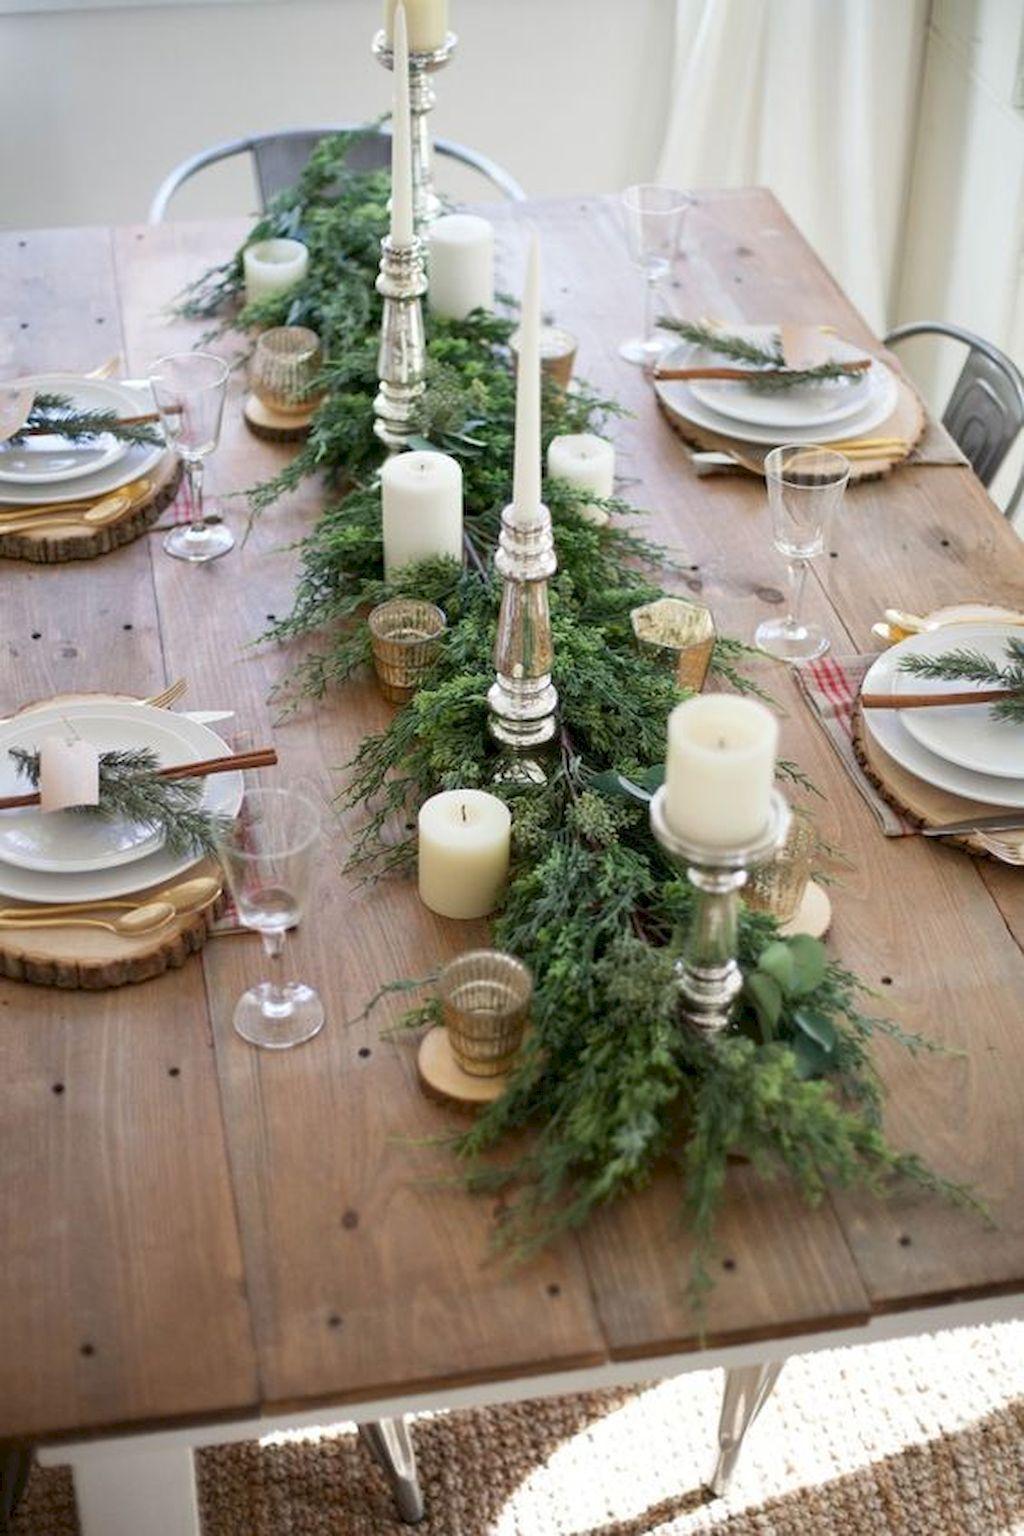 Gorgeous 25 Elegant Christmas Party Table Decorations Ideas Https Livingmarch Com 25 Christmas Table Decorations Christmas Tablescapes Christmas Decorations